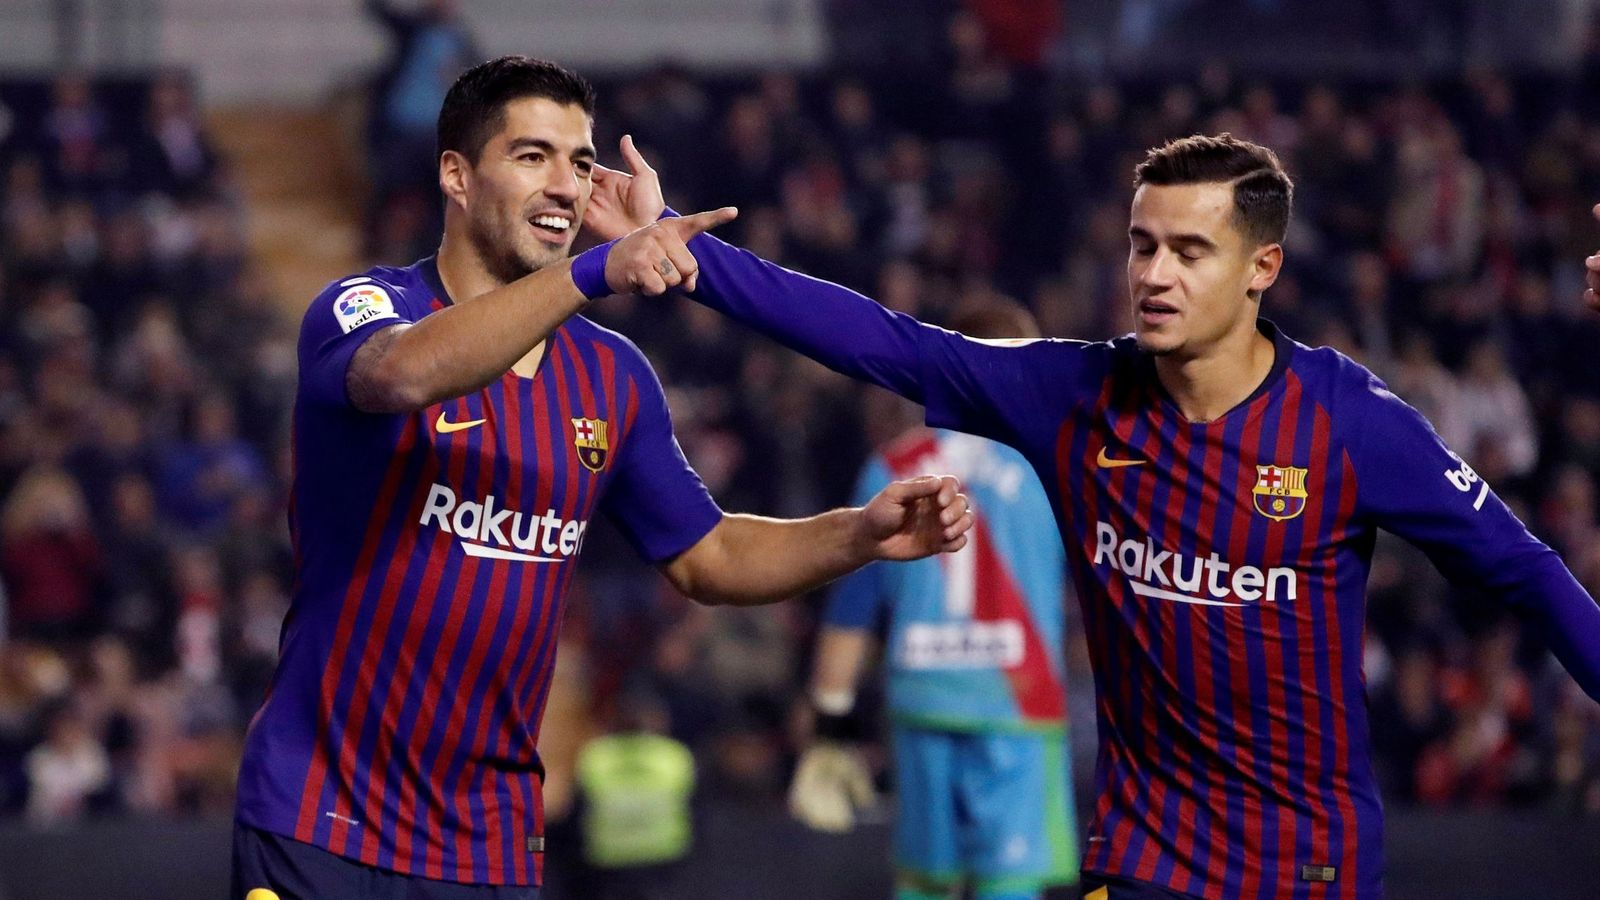 b78cd6d02f9f0 FC Barcelona  Luis Suárez ocupa el vacío de Messi que Coutinho no ayuda a  llenar